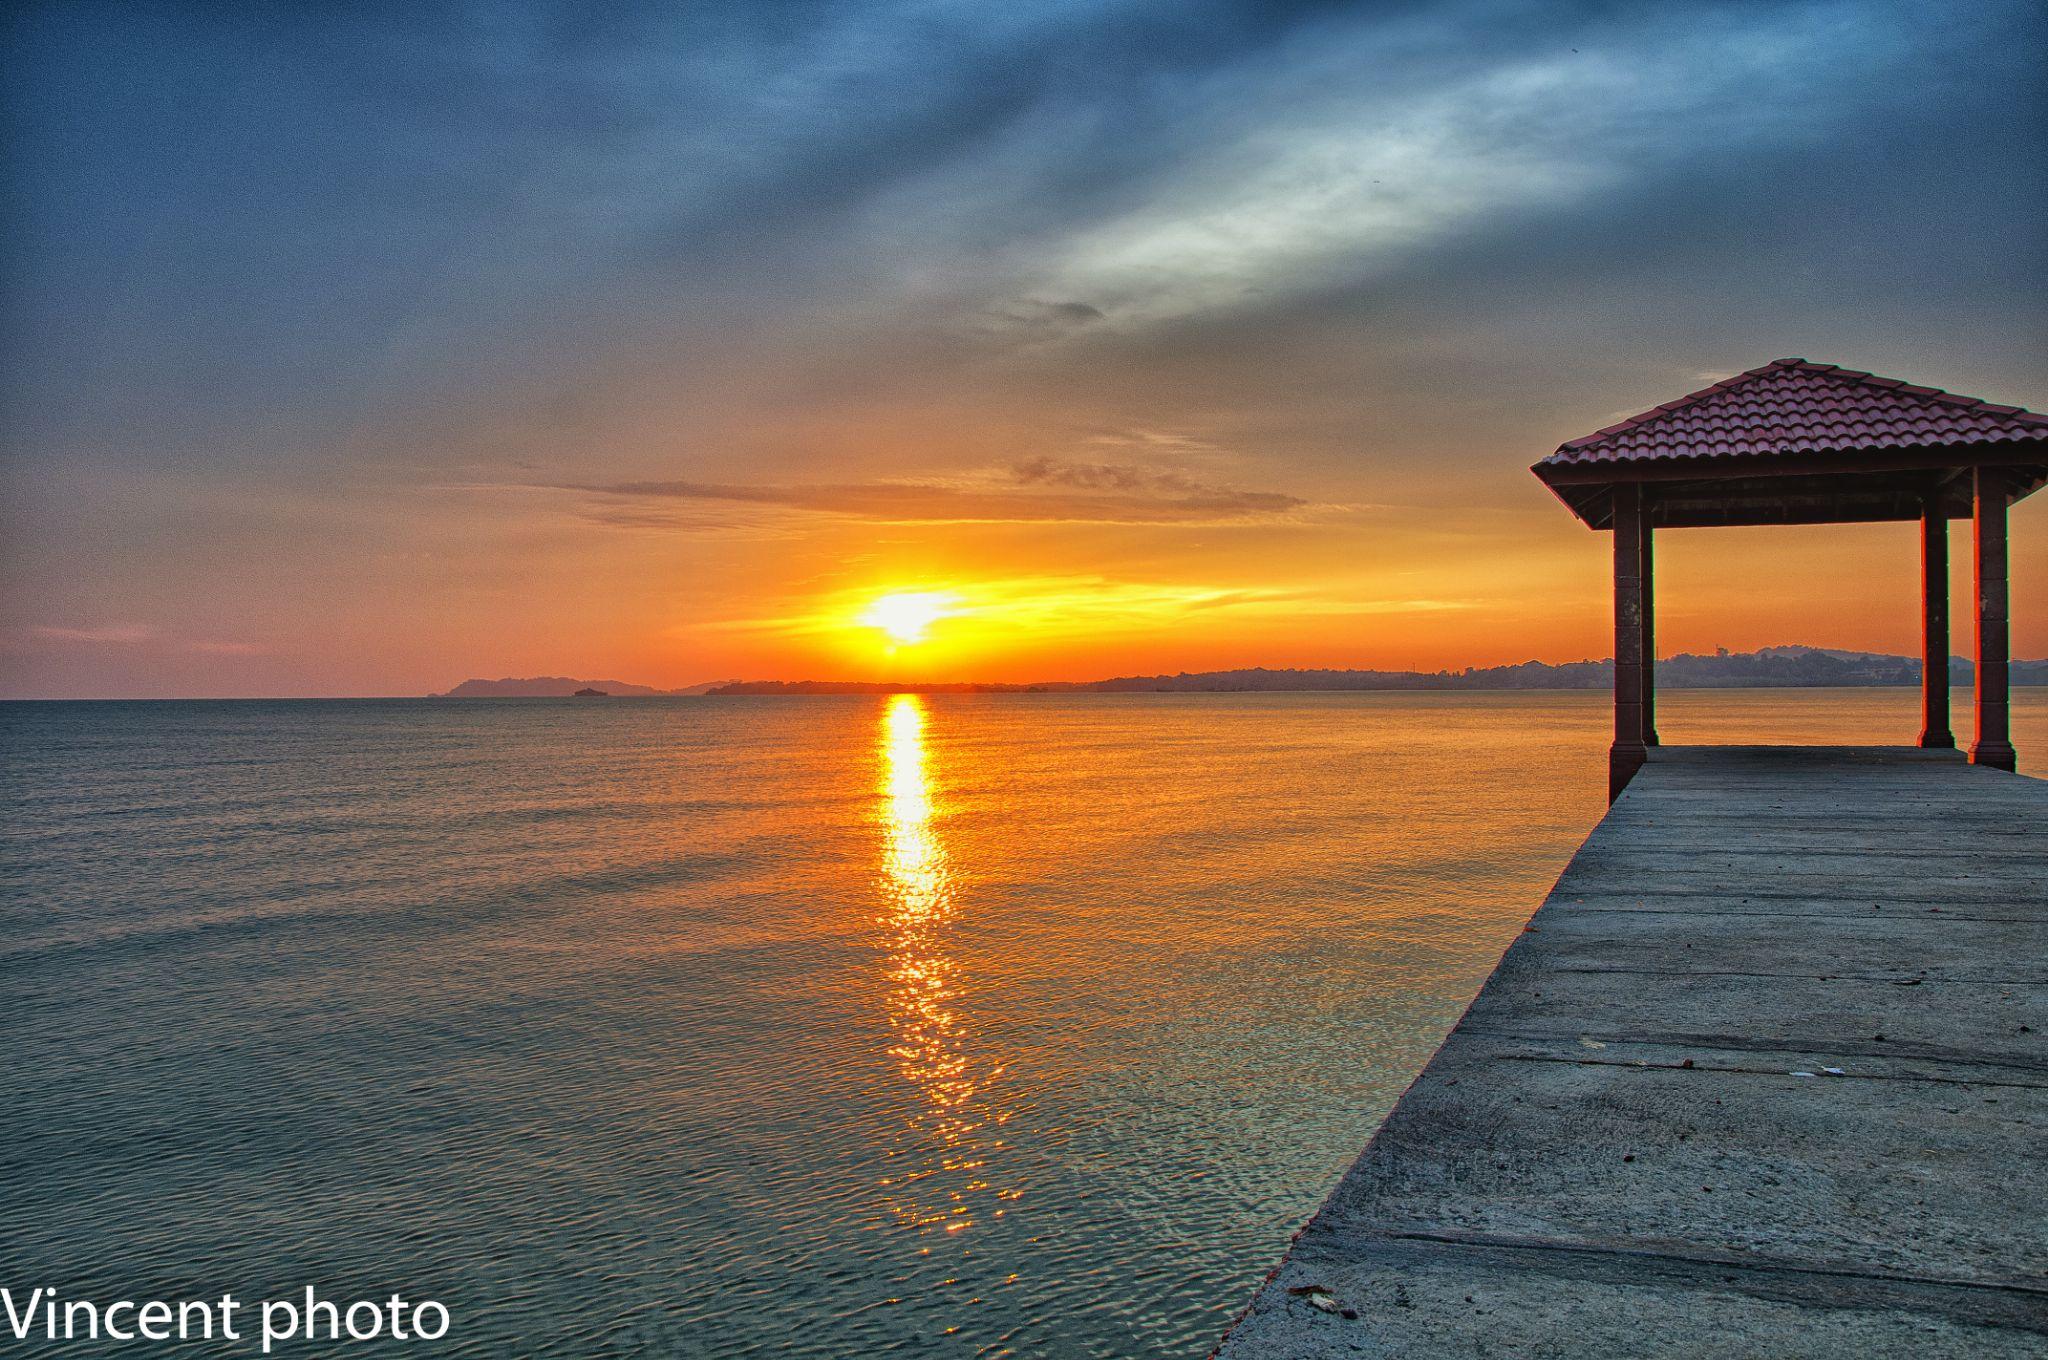 sunset by vincentkfyan